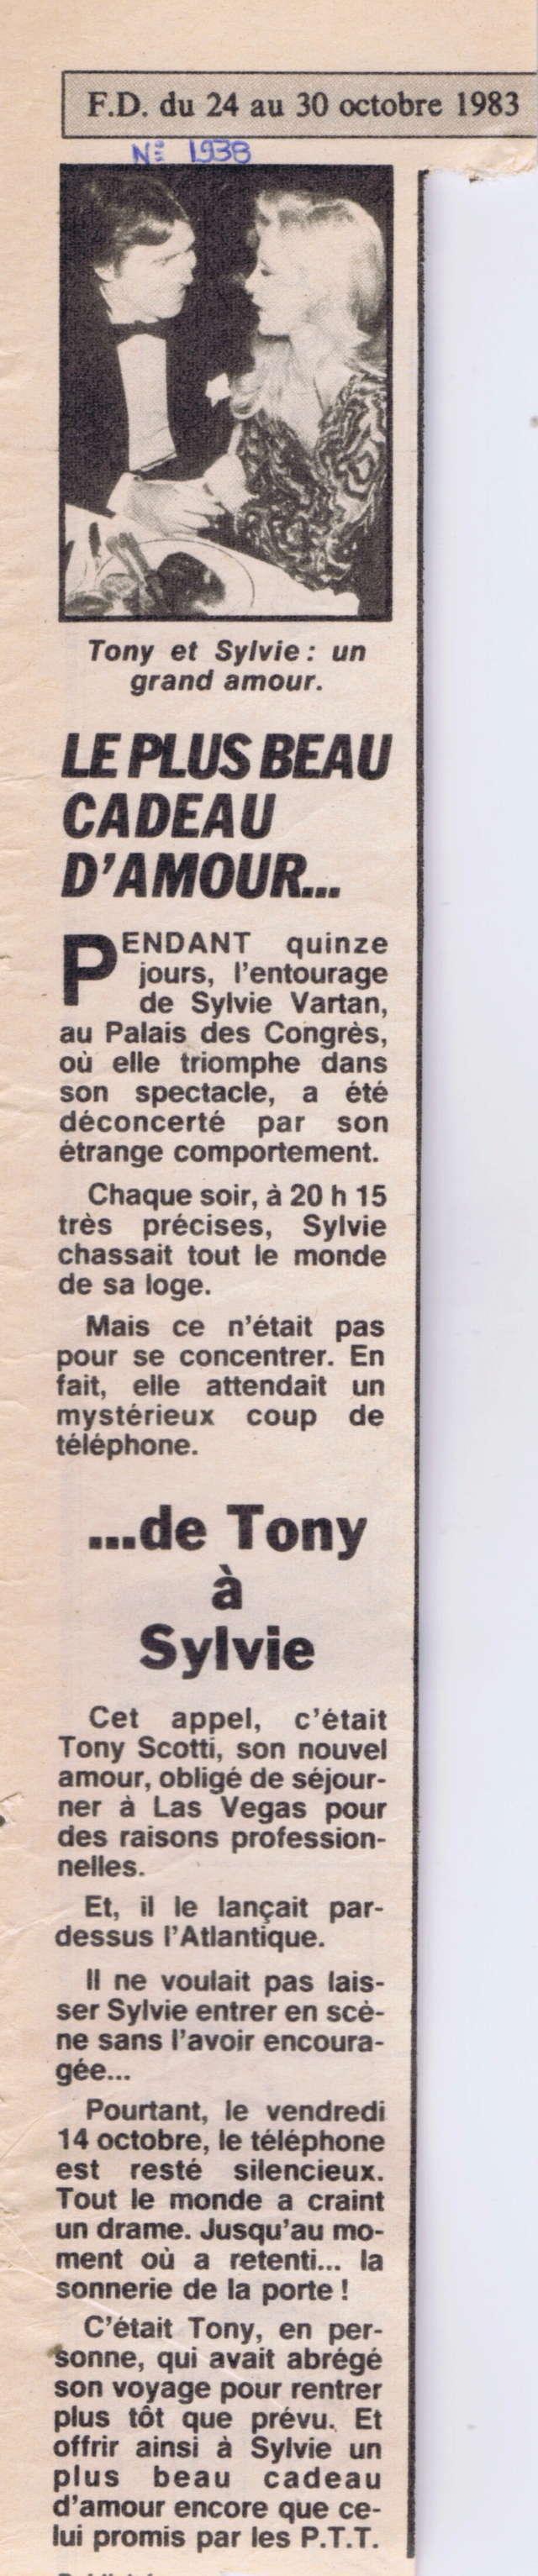 "Discographie N° 82 ""DANSE TA VIE"" - ""DEPRIME"" - Page 2 France63"